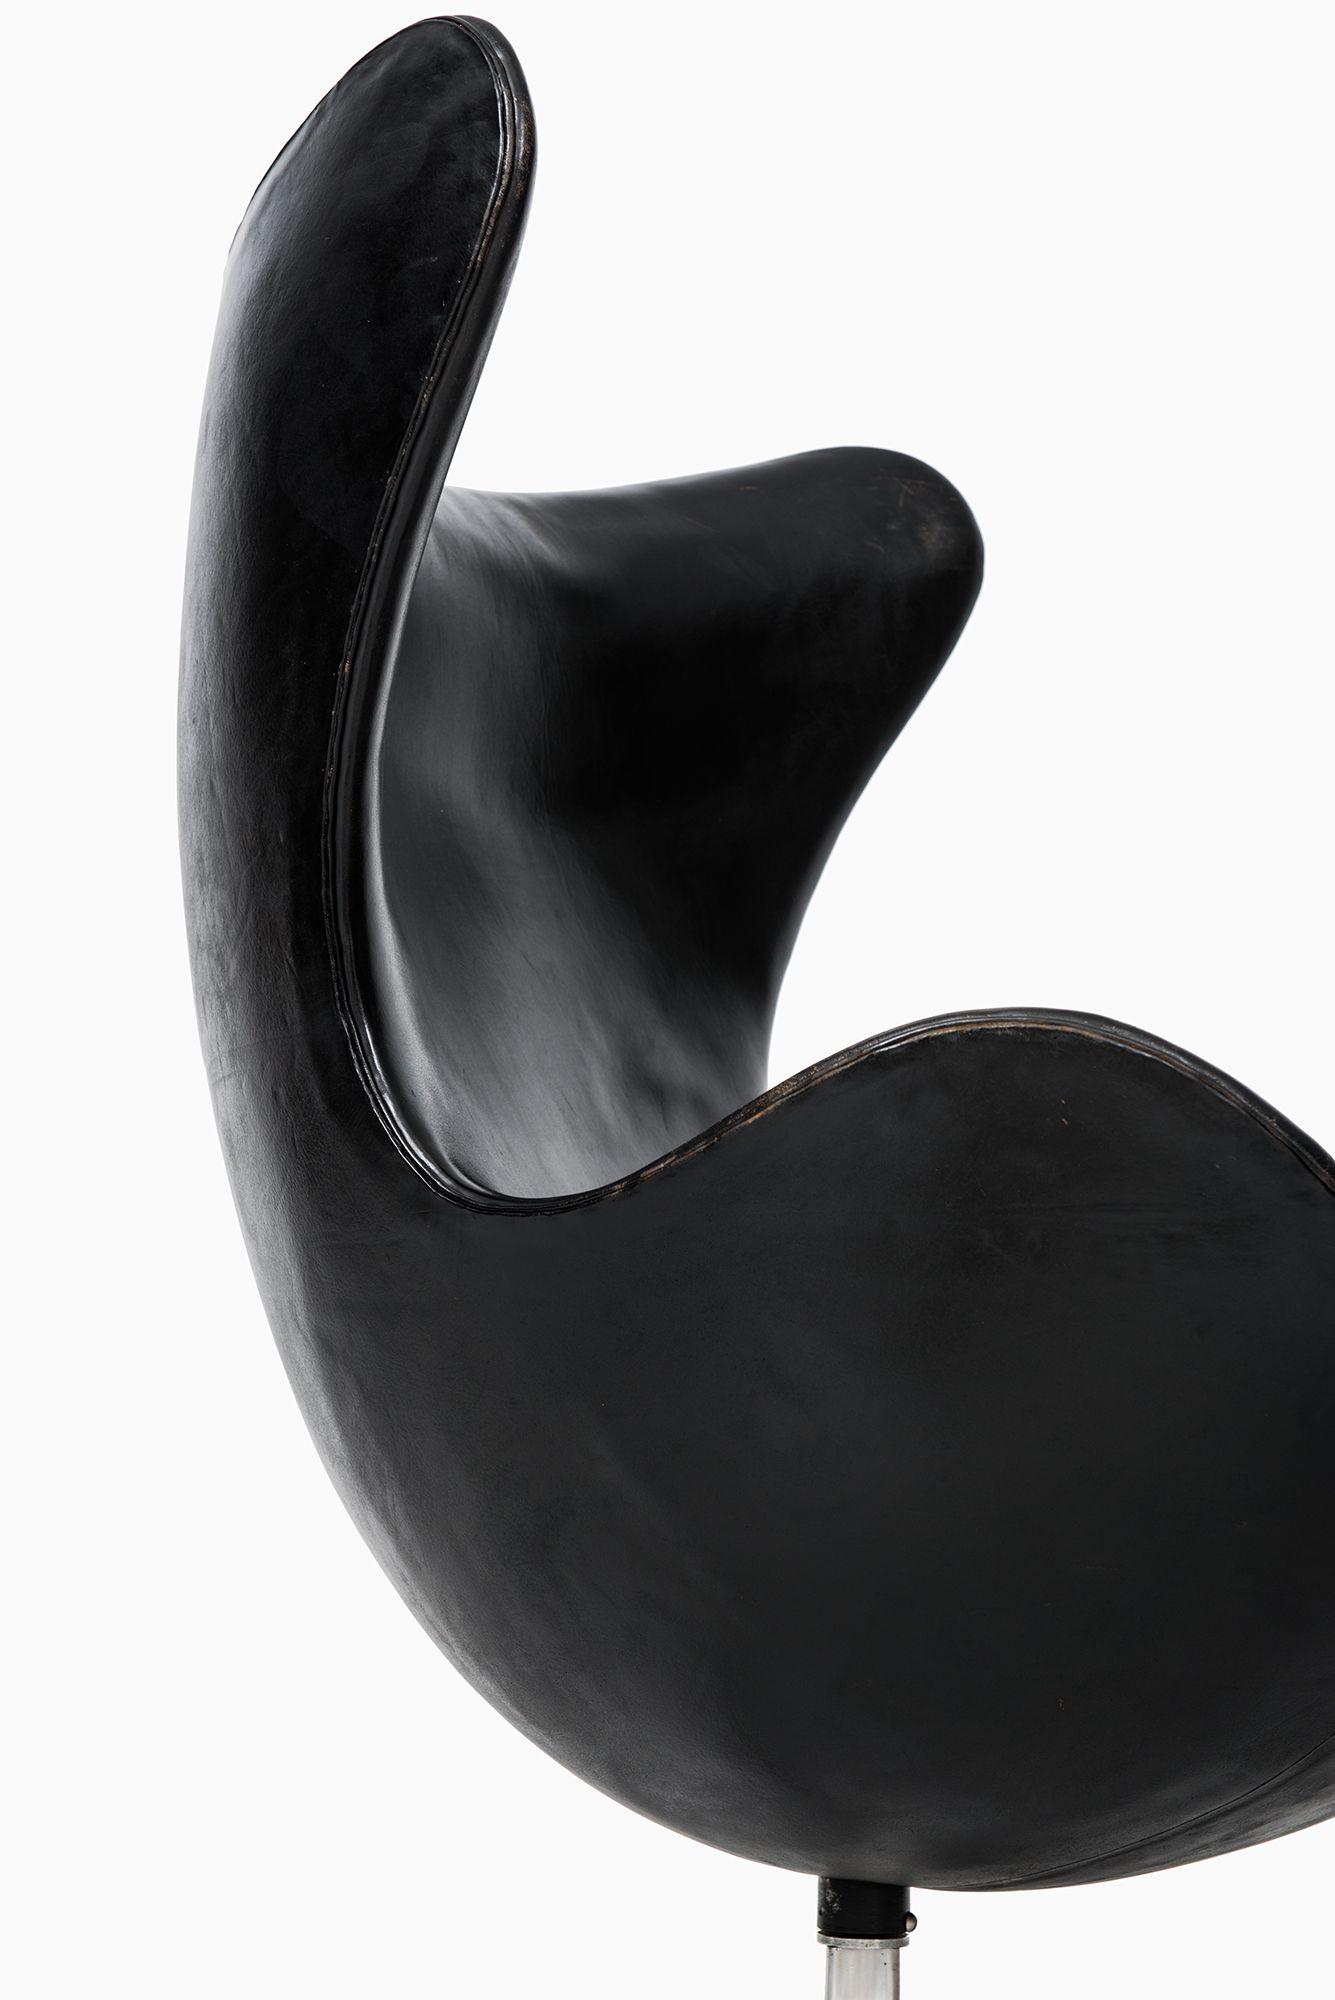 Arne Jacobsen Egg Chair Egg Chair Leather Chaise Lounge Chair